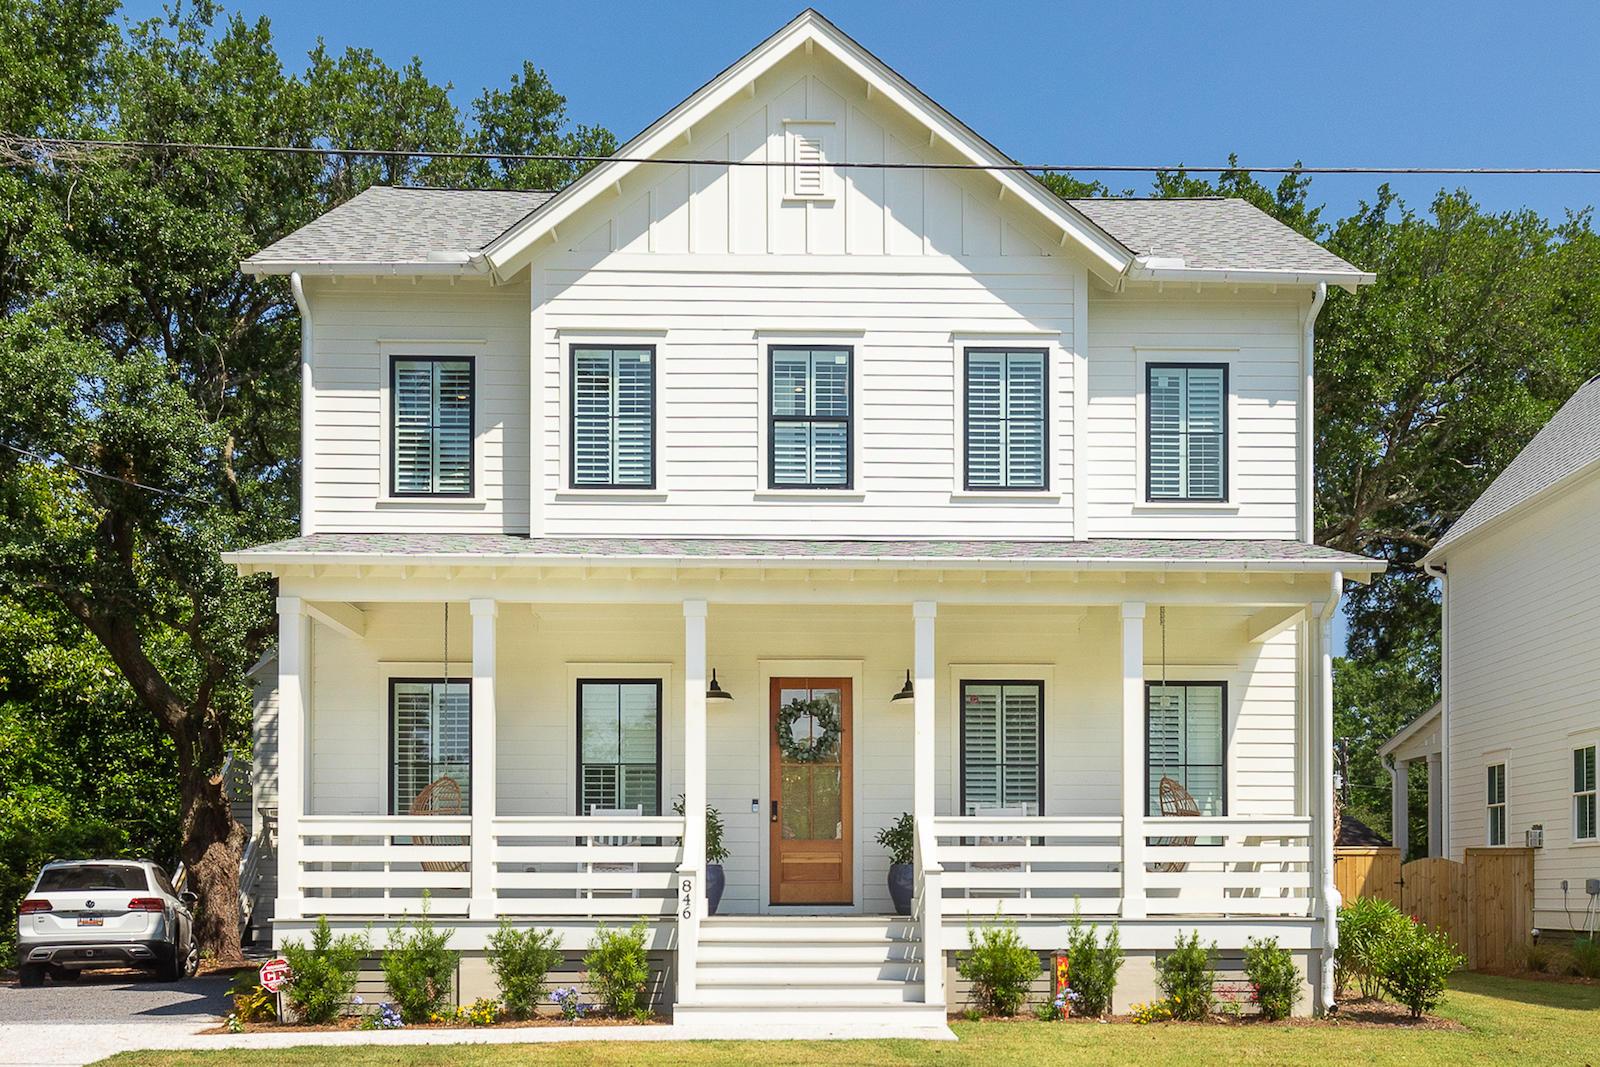 Old Mt Pleasant Homes For Sale - 546 Center, Mount Pleasant, SC - 37